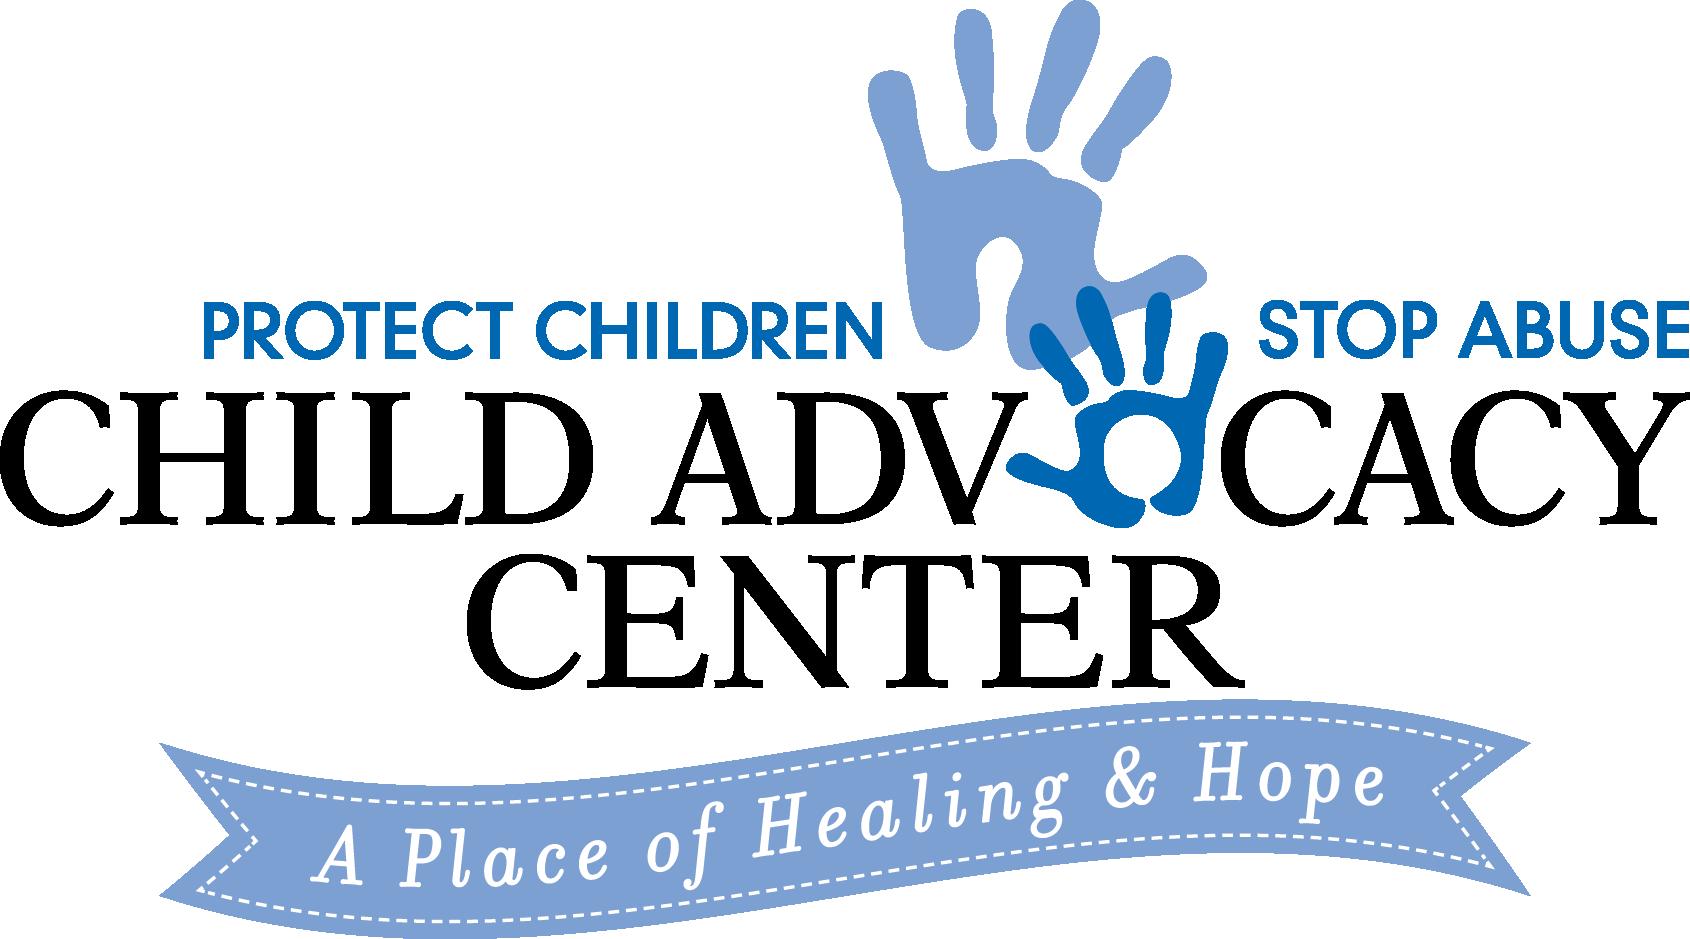 Lake County Children's Advocacy Center